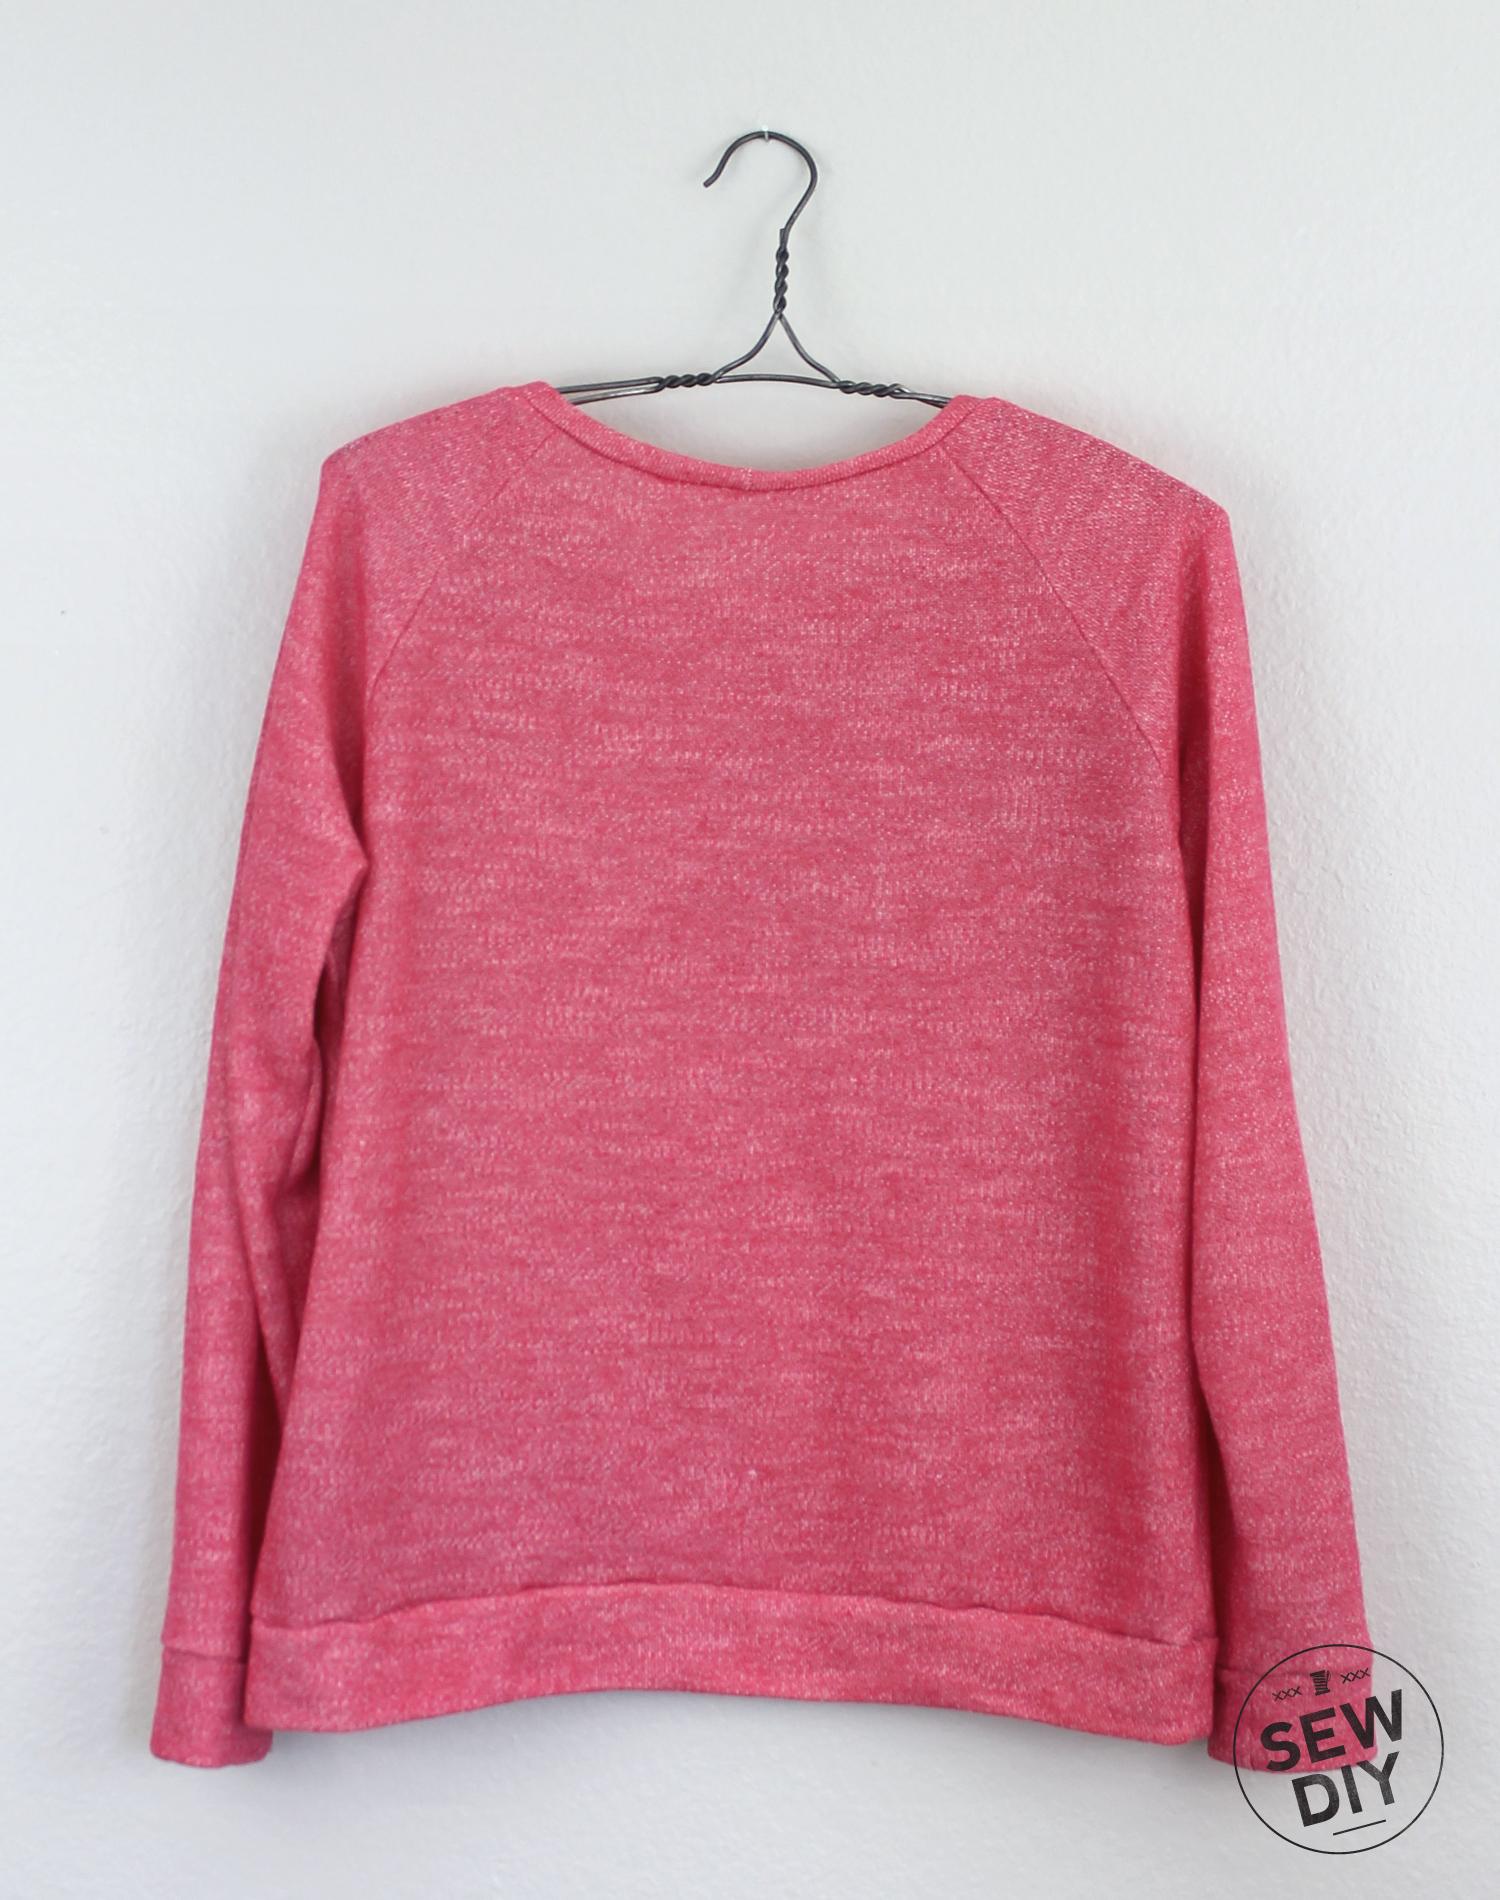 DIY Kangaroo Pocket Linden Sweatshirt Back – Sew DIY